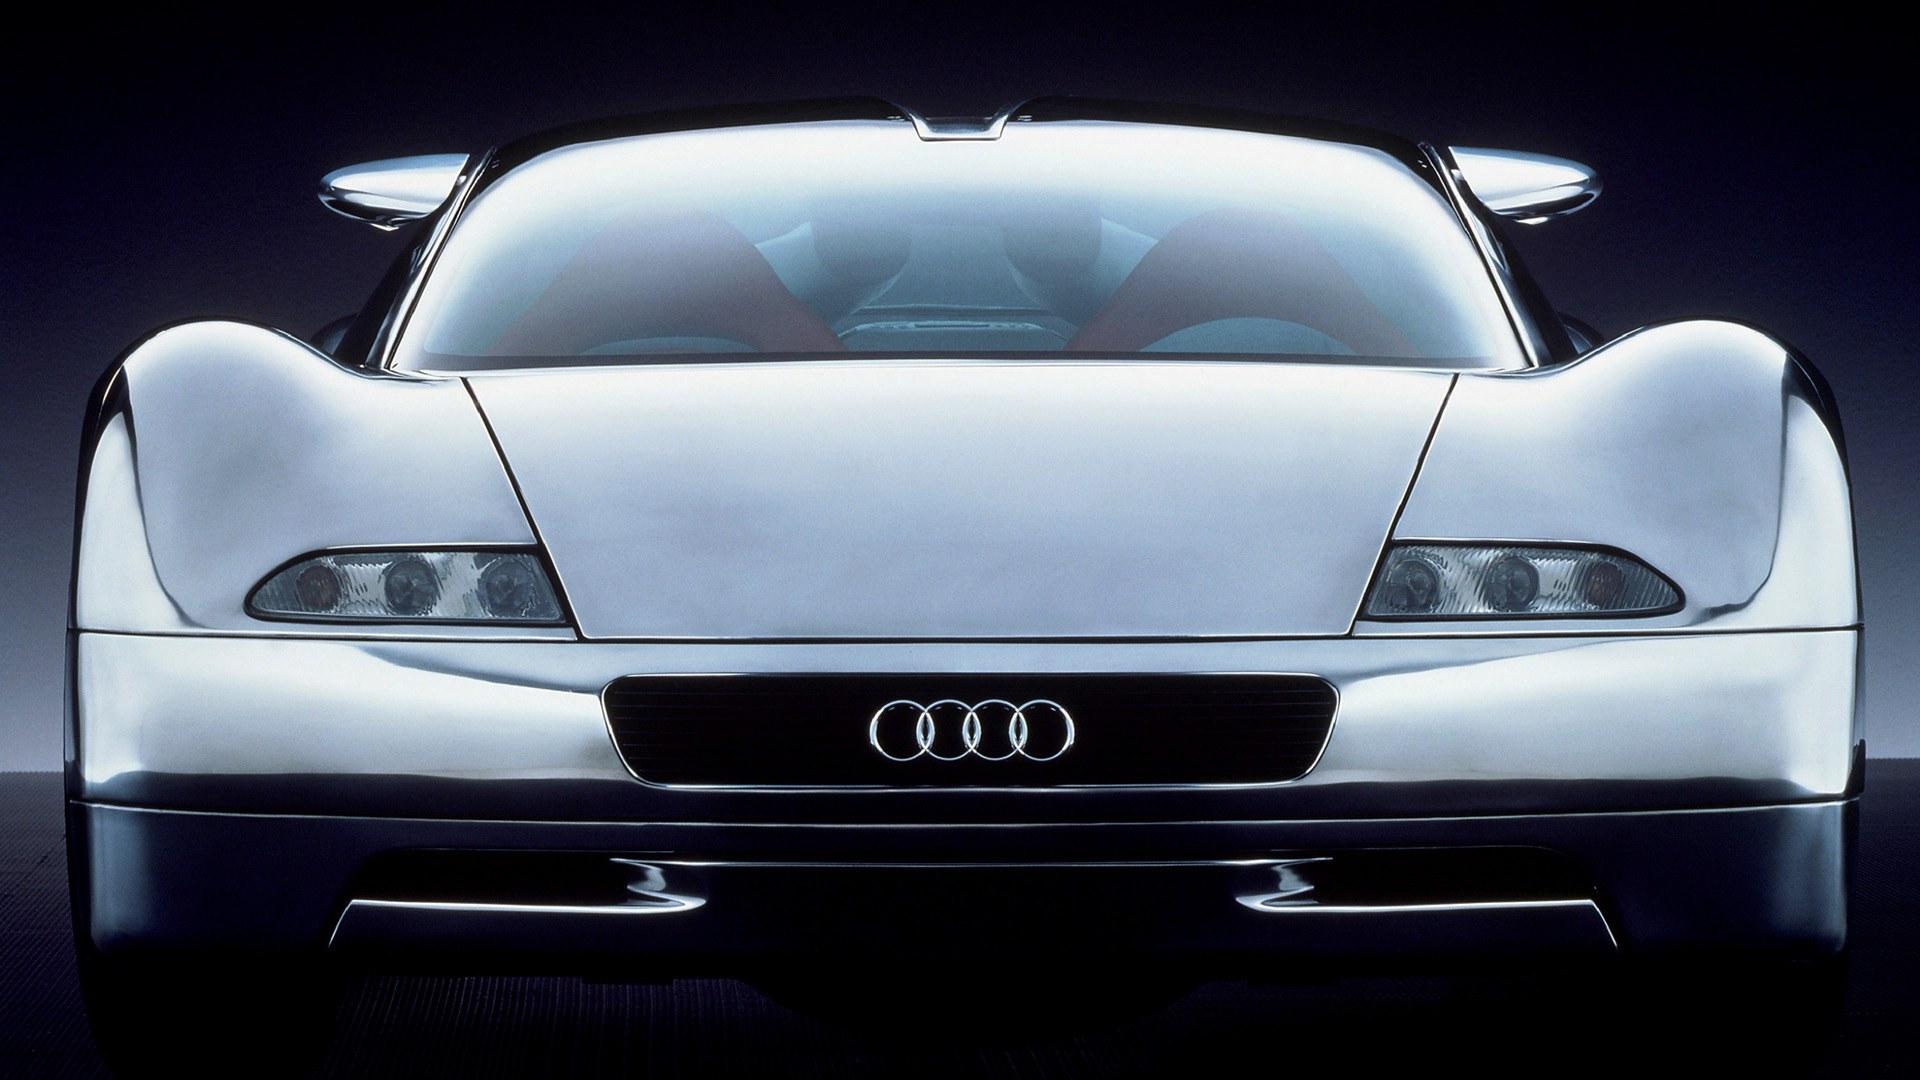 Coche del día: Audi AVUS quattro Concept